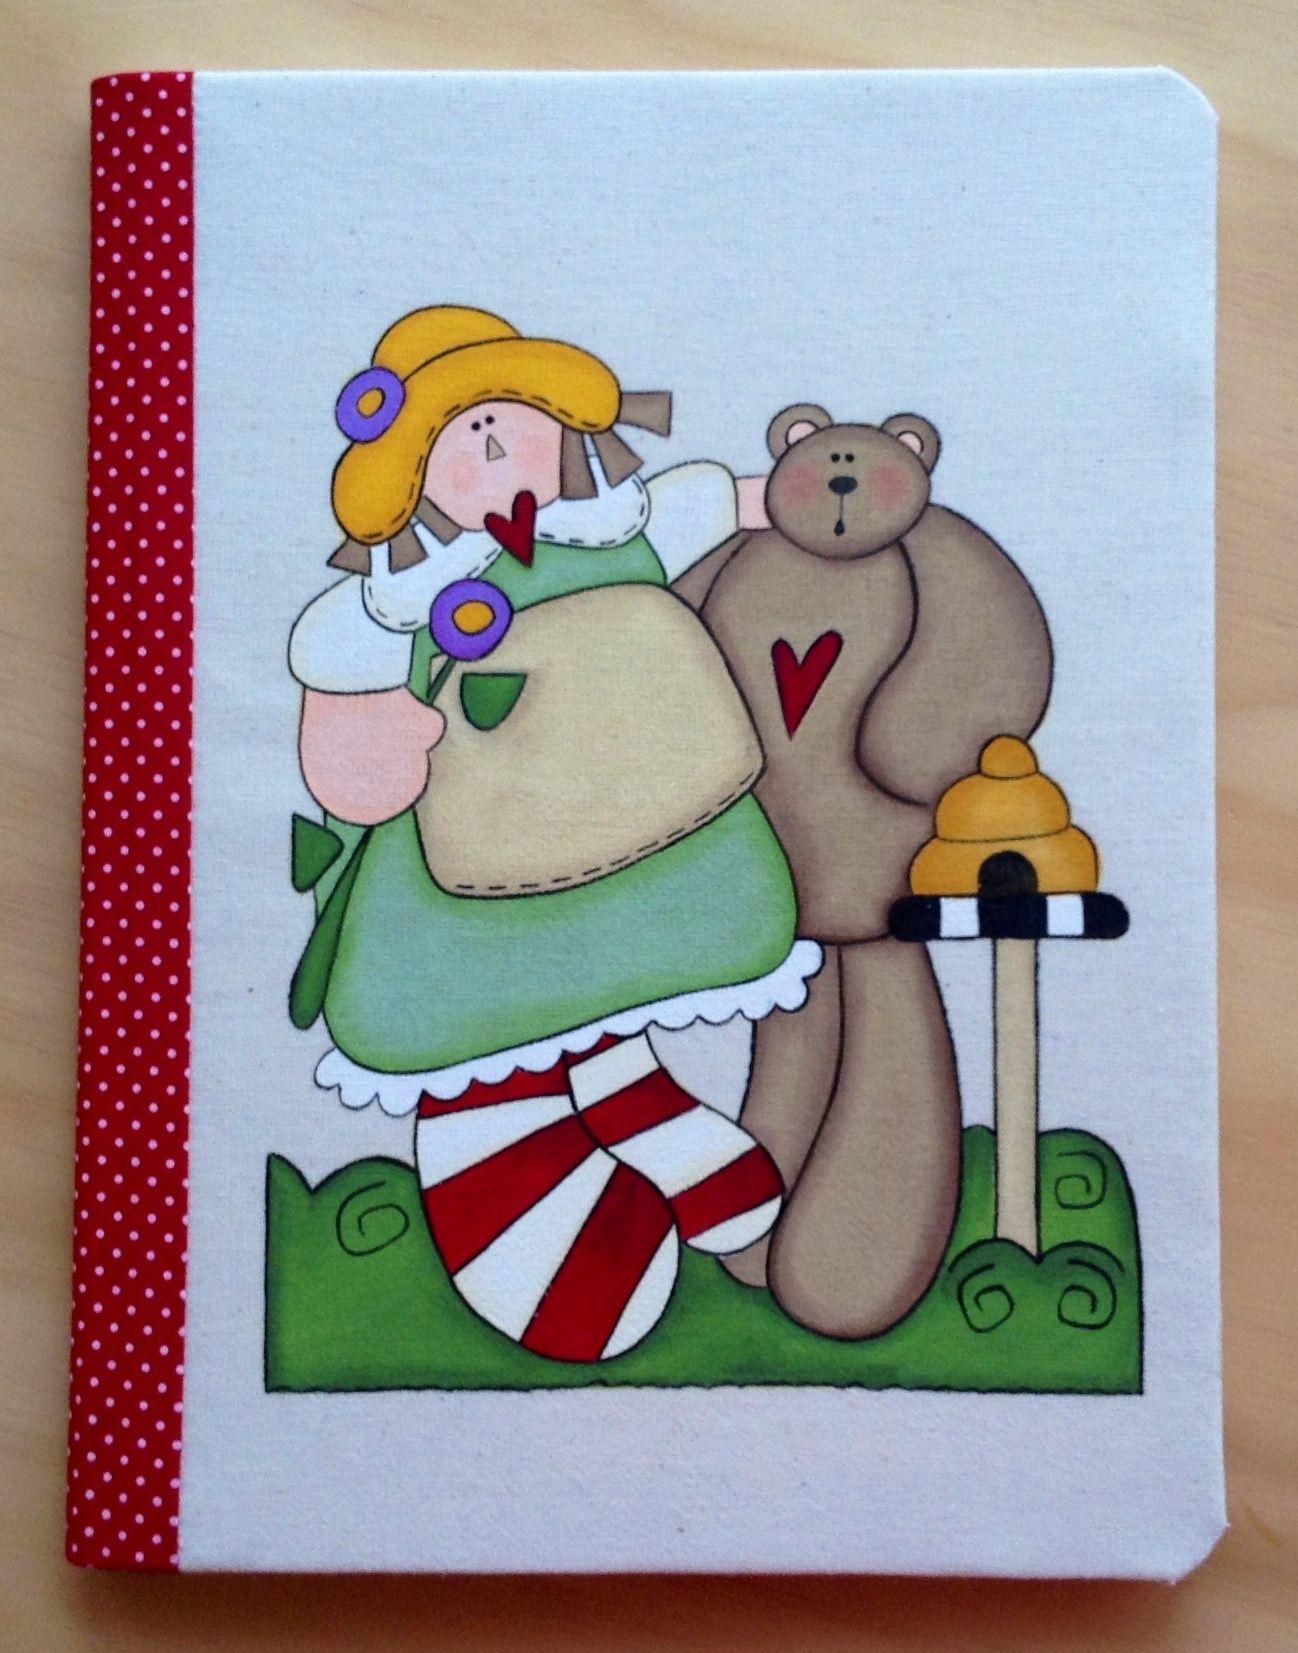 Cuaderno Con Forro de Tela Pintado a Mano por Angélica Tamayo